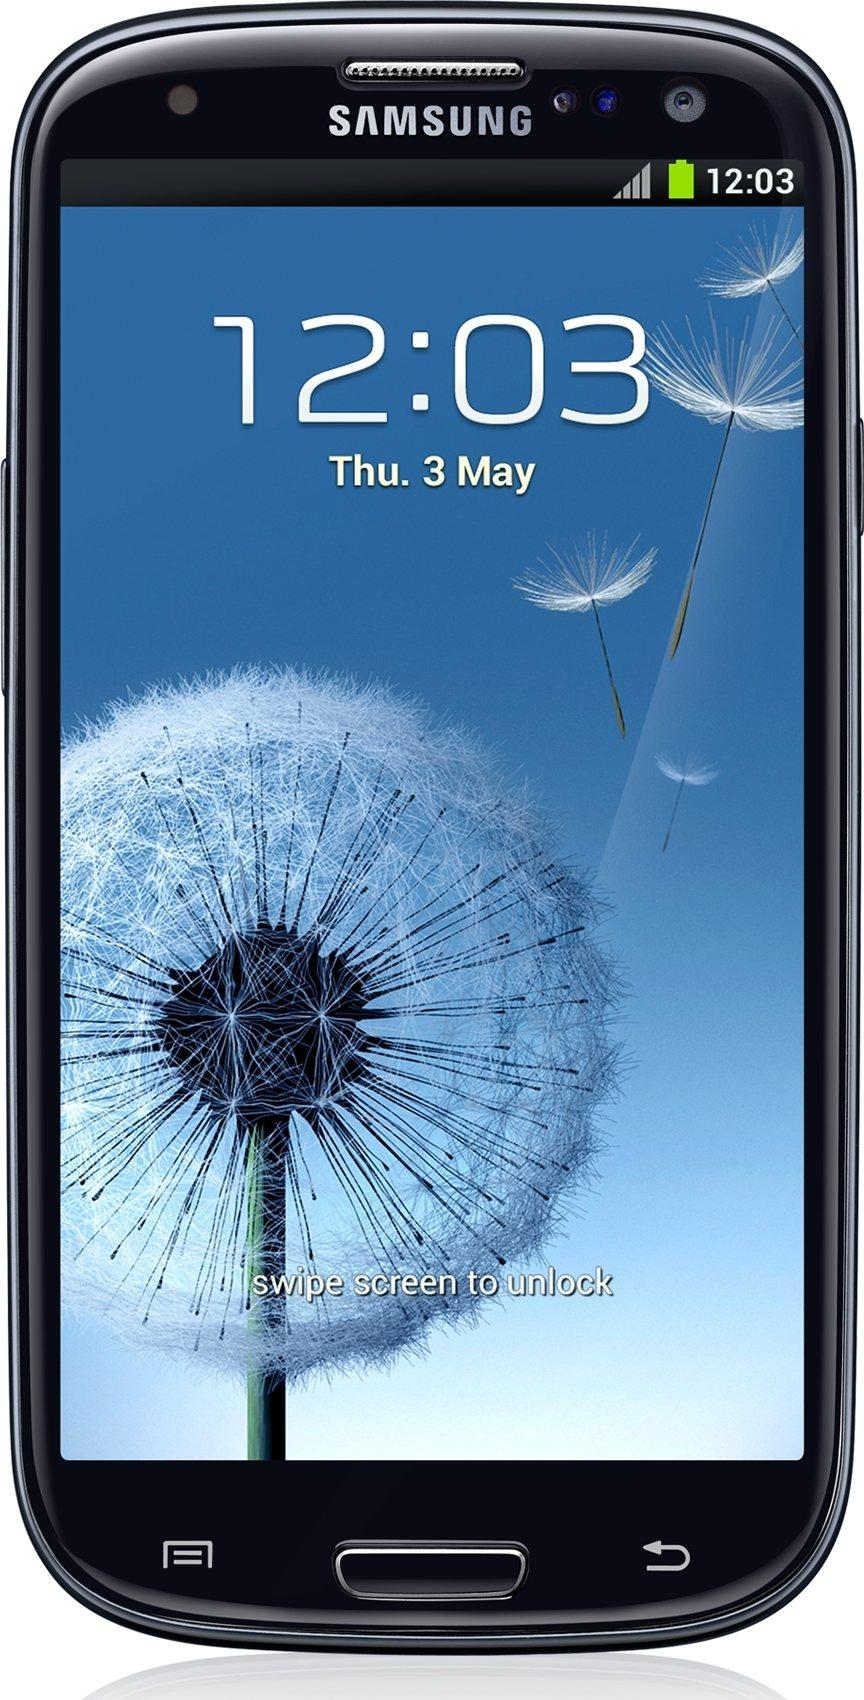 Galaxy S 3 LTE GT-I9305